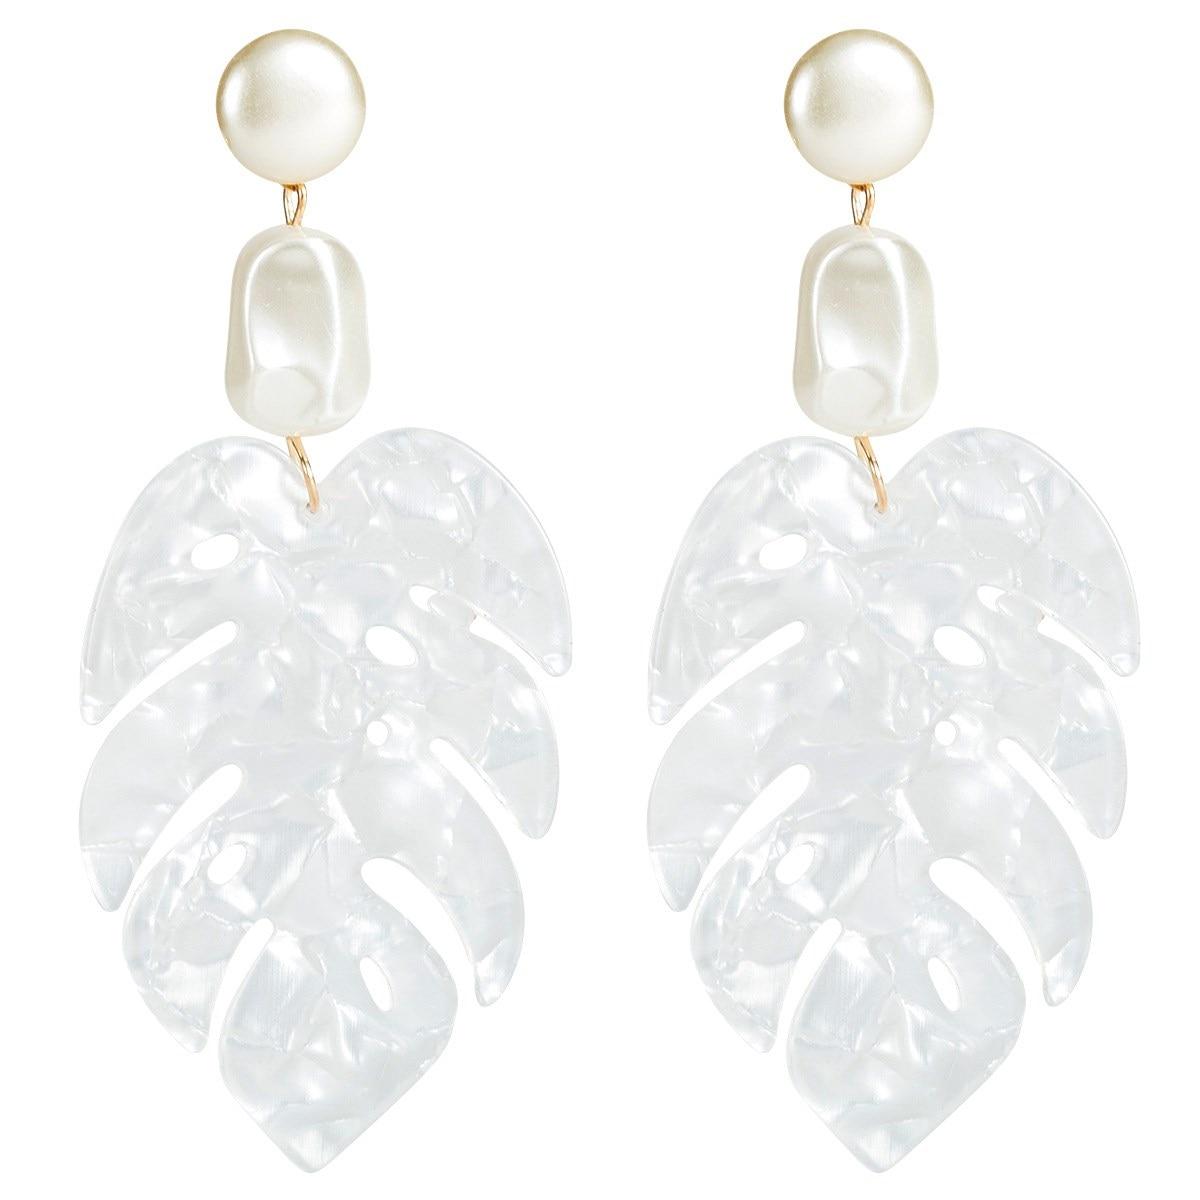 2019 New Arrival White Color Resin Leaf Drop Earring Big Geometric Boho Dangle Earring in Drop Earrings from Jewelry Accessories